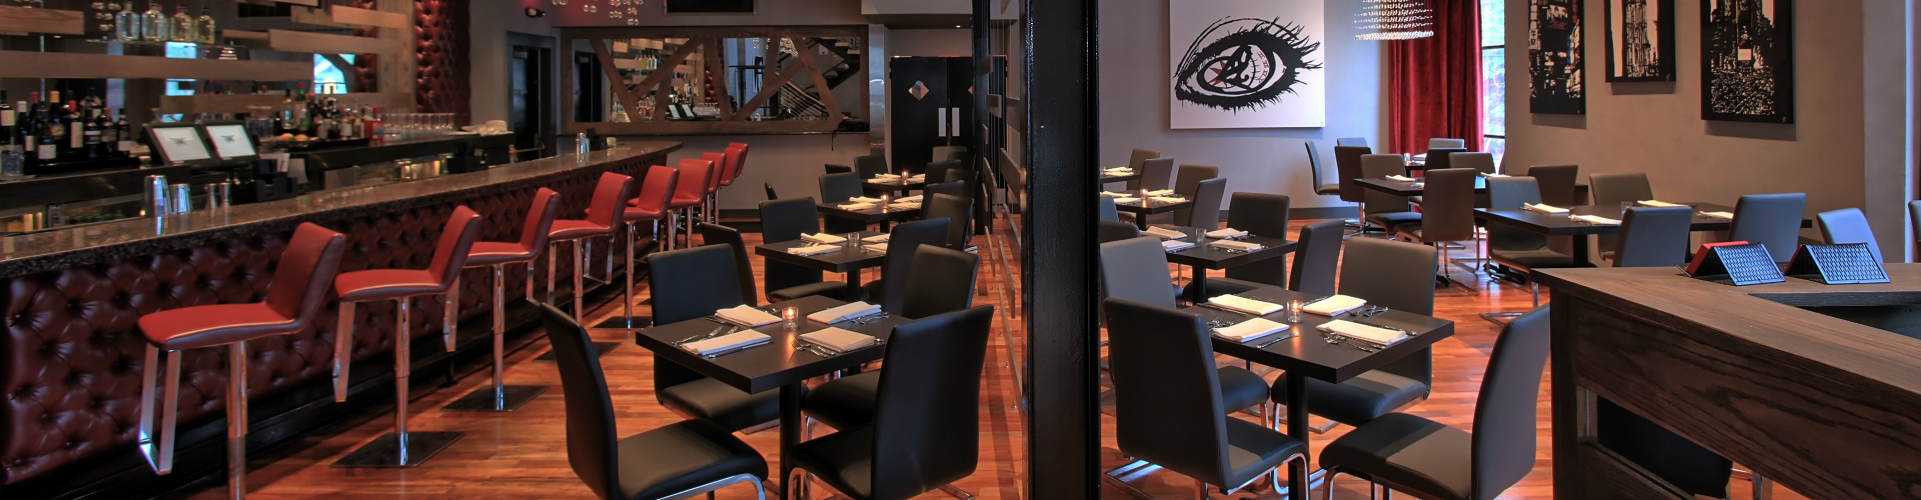 time restaurant atlanta georgia ga. Black Bedroom Furniture Sets. Home Design Ideas